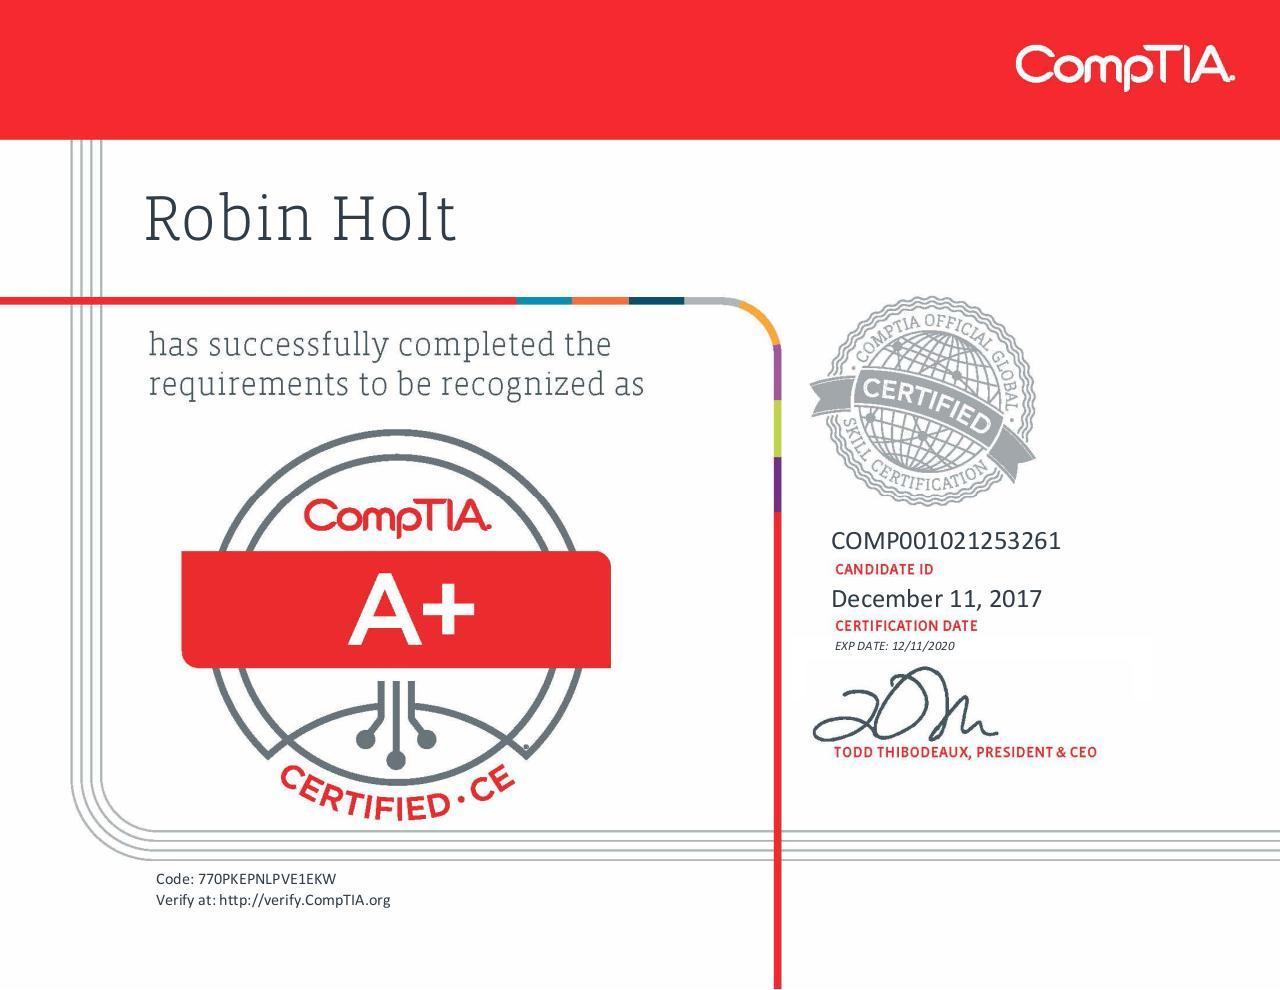 comptia certificate pdf documents